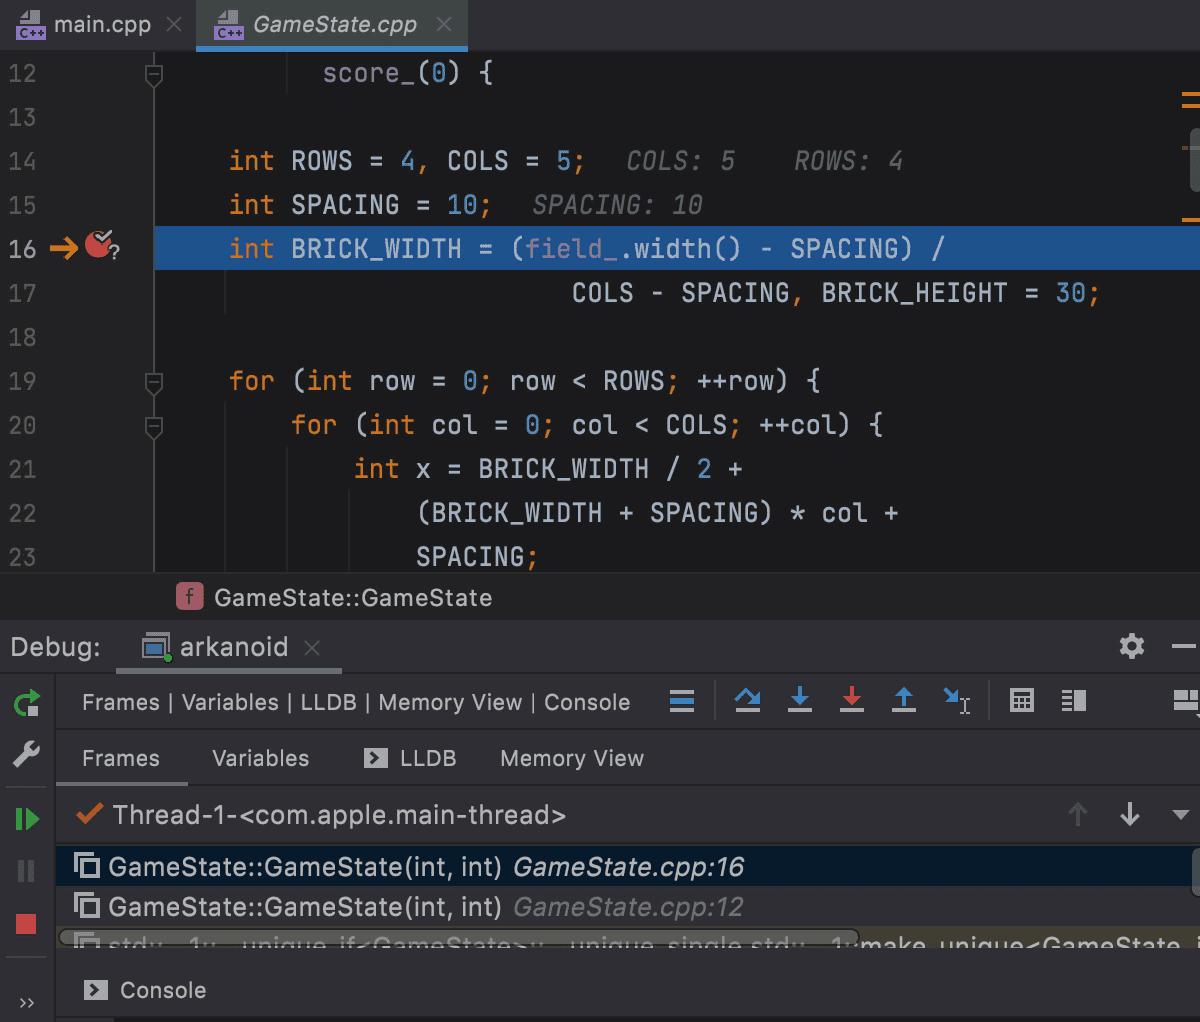 Preview Tab in debugger